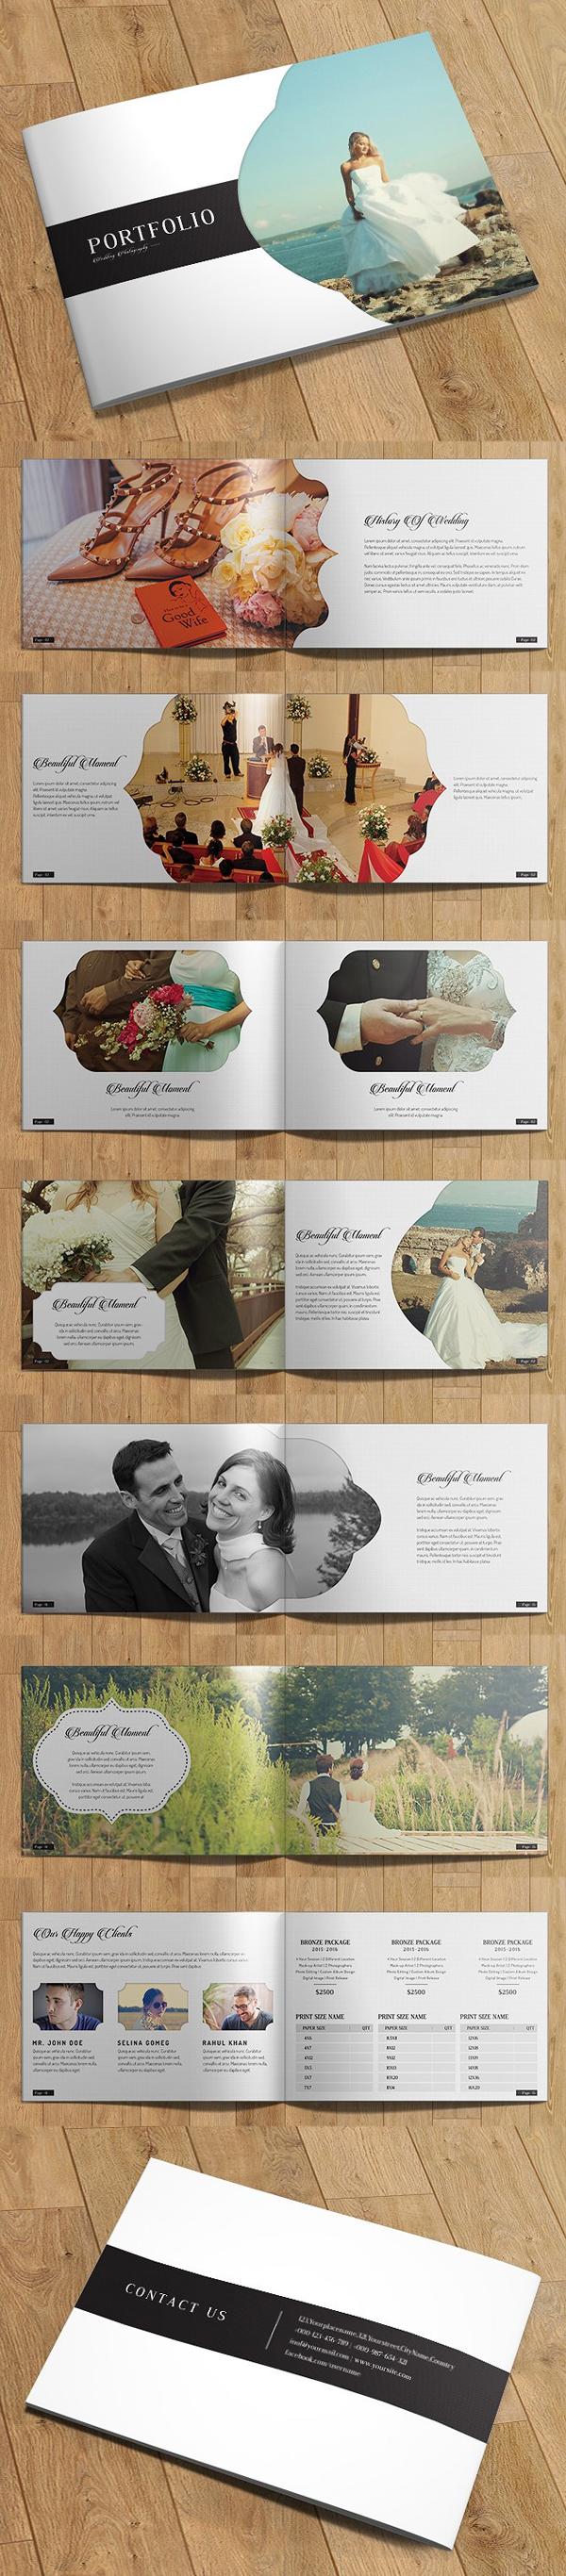 Wedding Photographer Portfolio